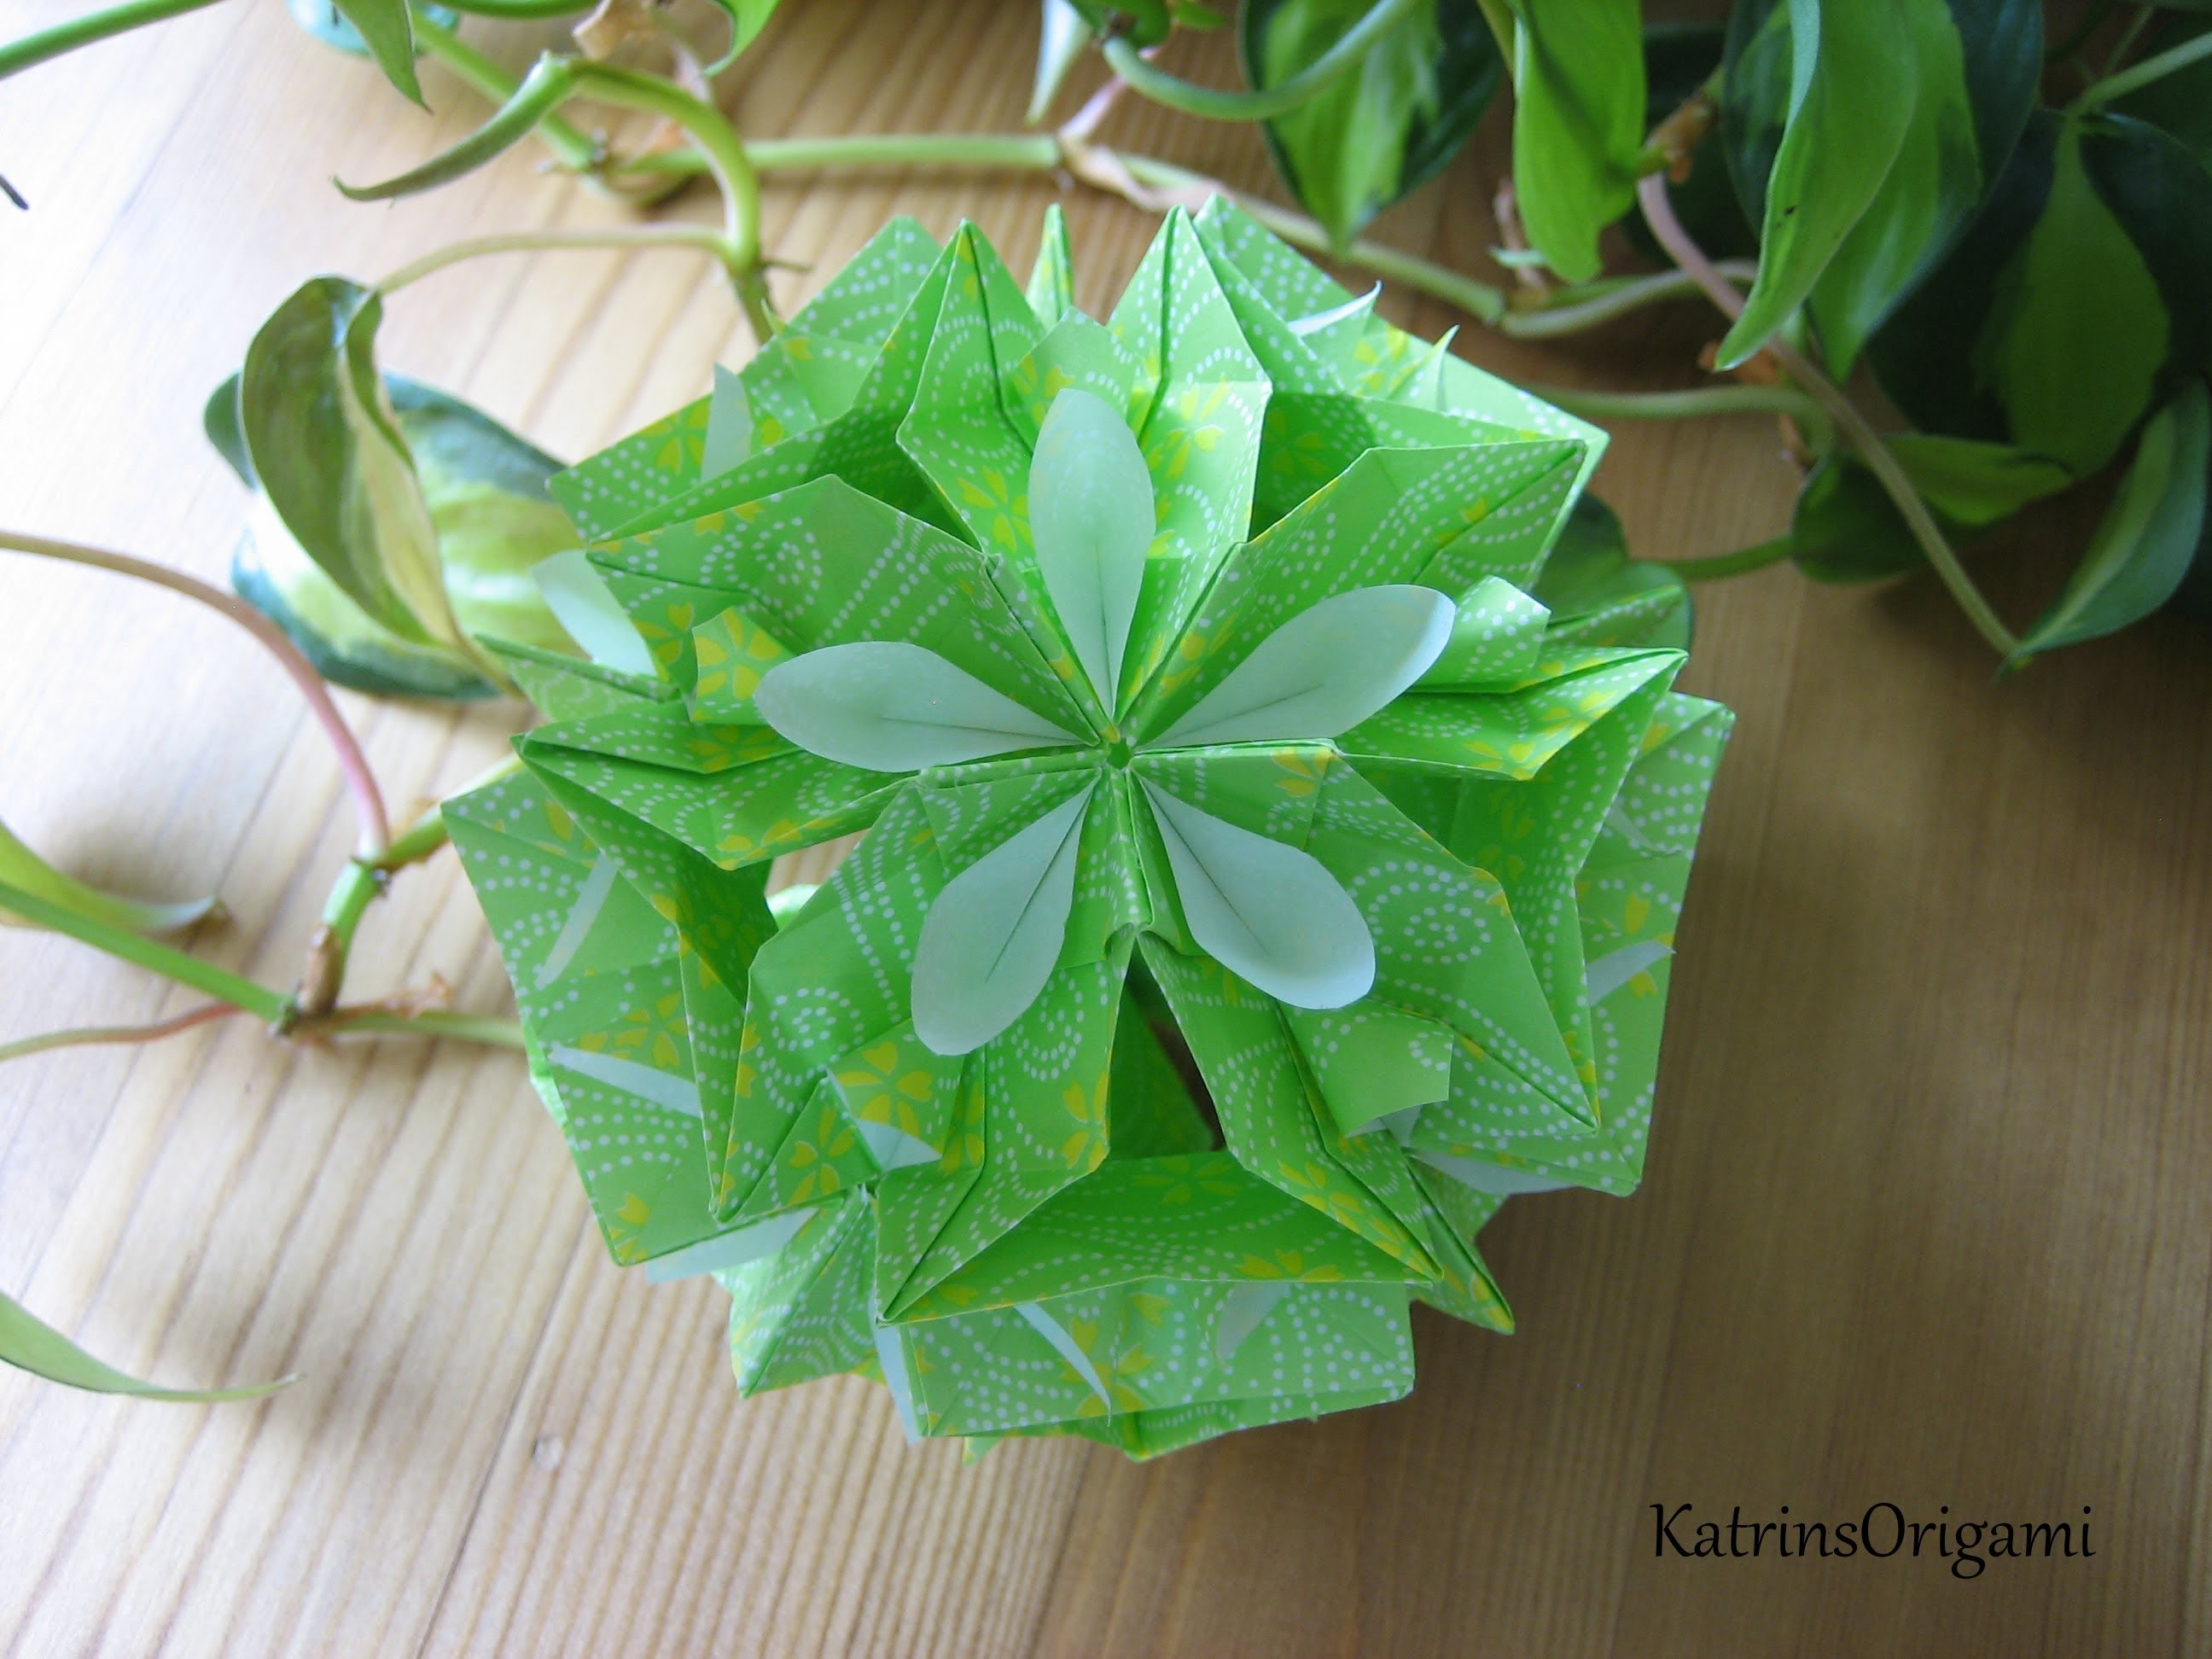 Origami ✿⊱╮ Floristry ✿⊱╮ Kusudama